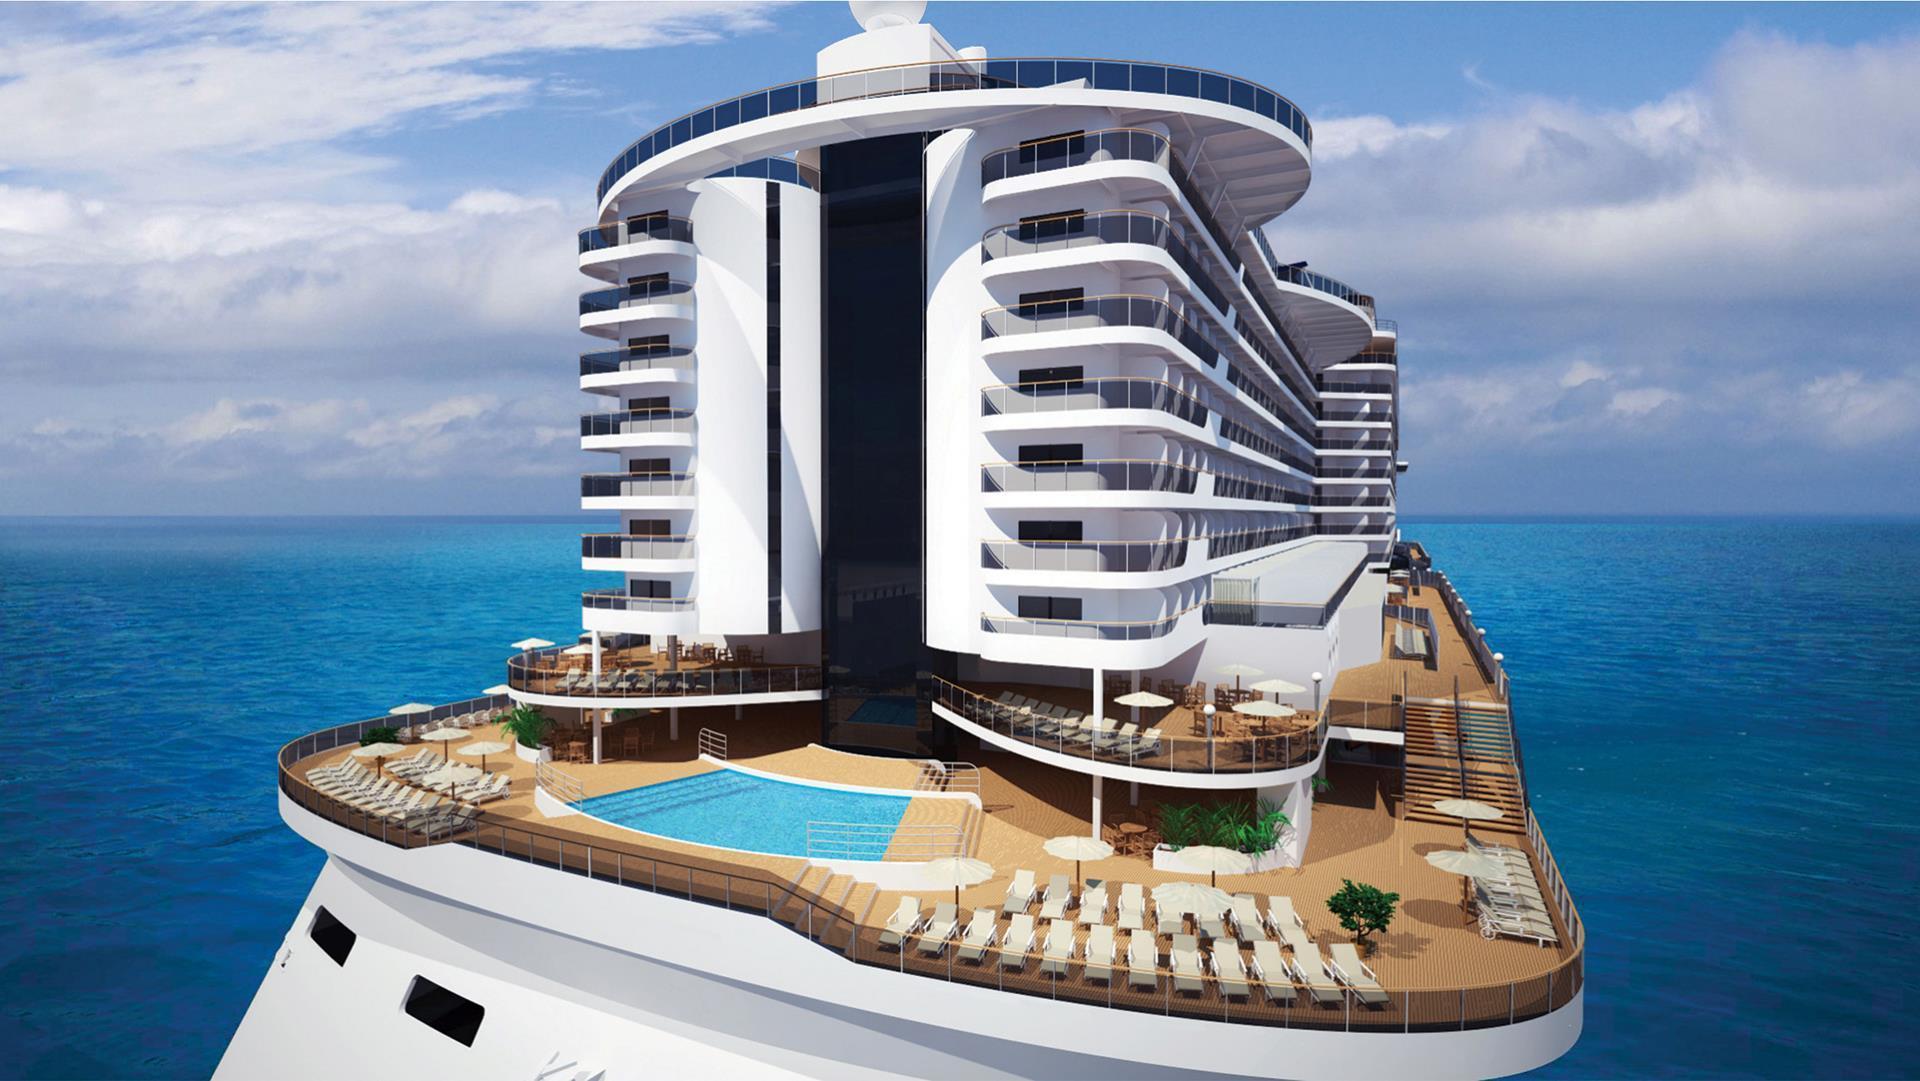 MSC presentó su nuevo crucero: Seaside